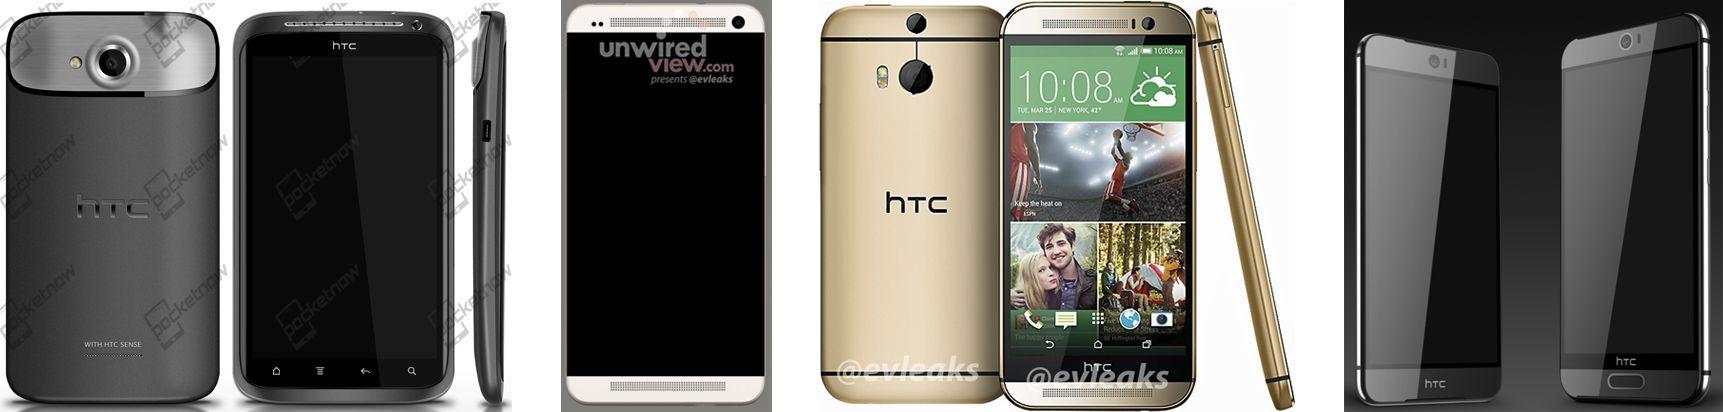 hauts de gamme HTC